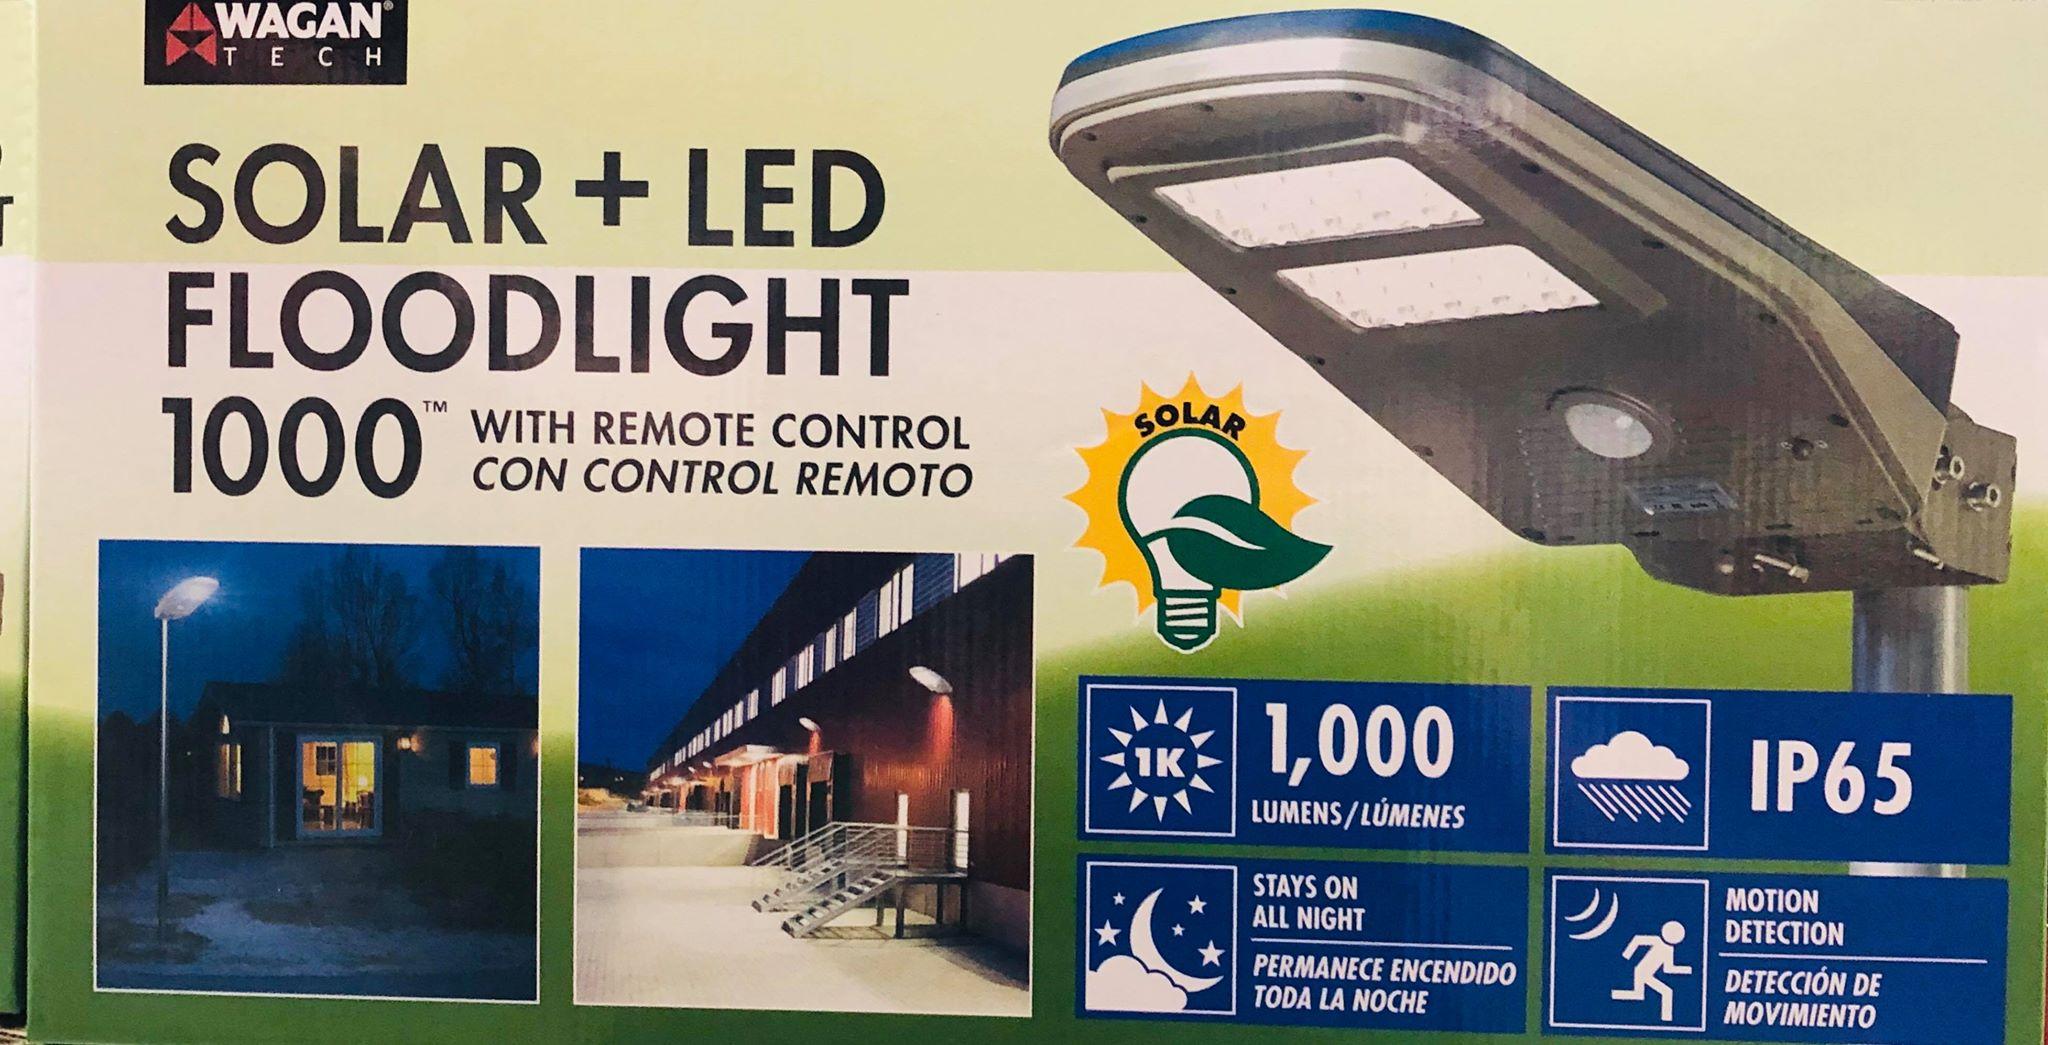 Wagan Luz de calle solar de LED de 1,000 lúmenes área detectada por movimiento